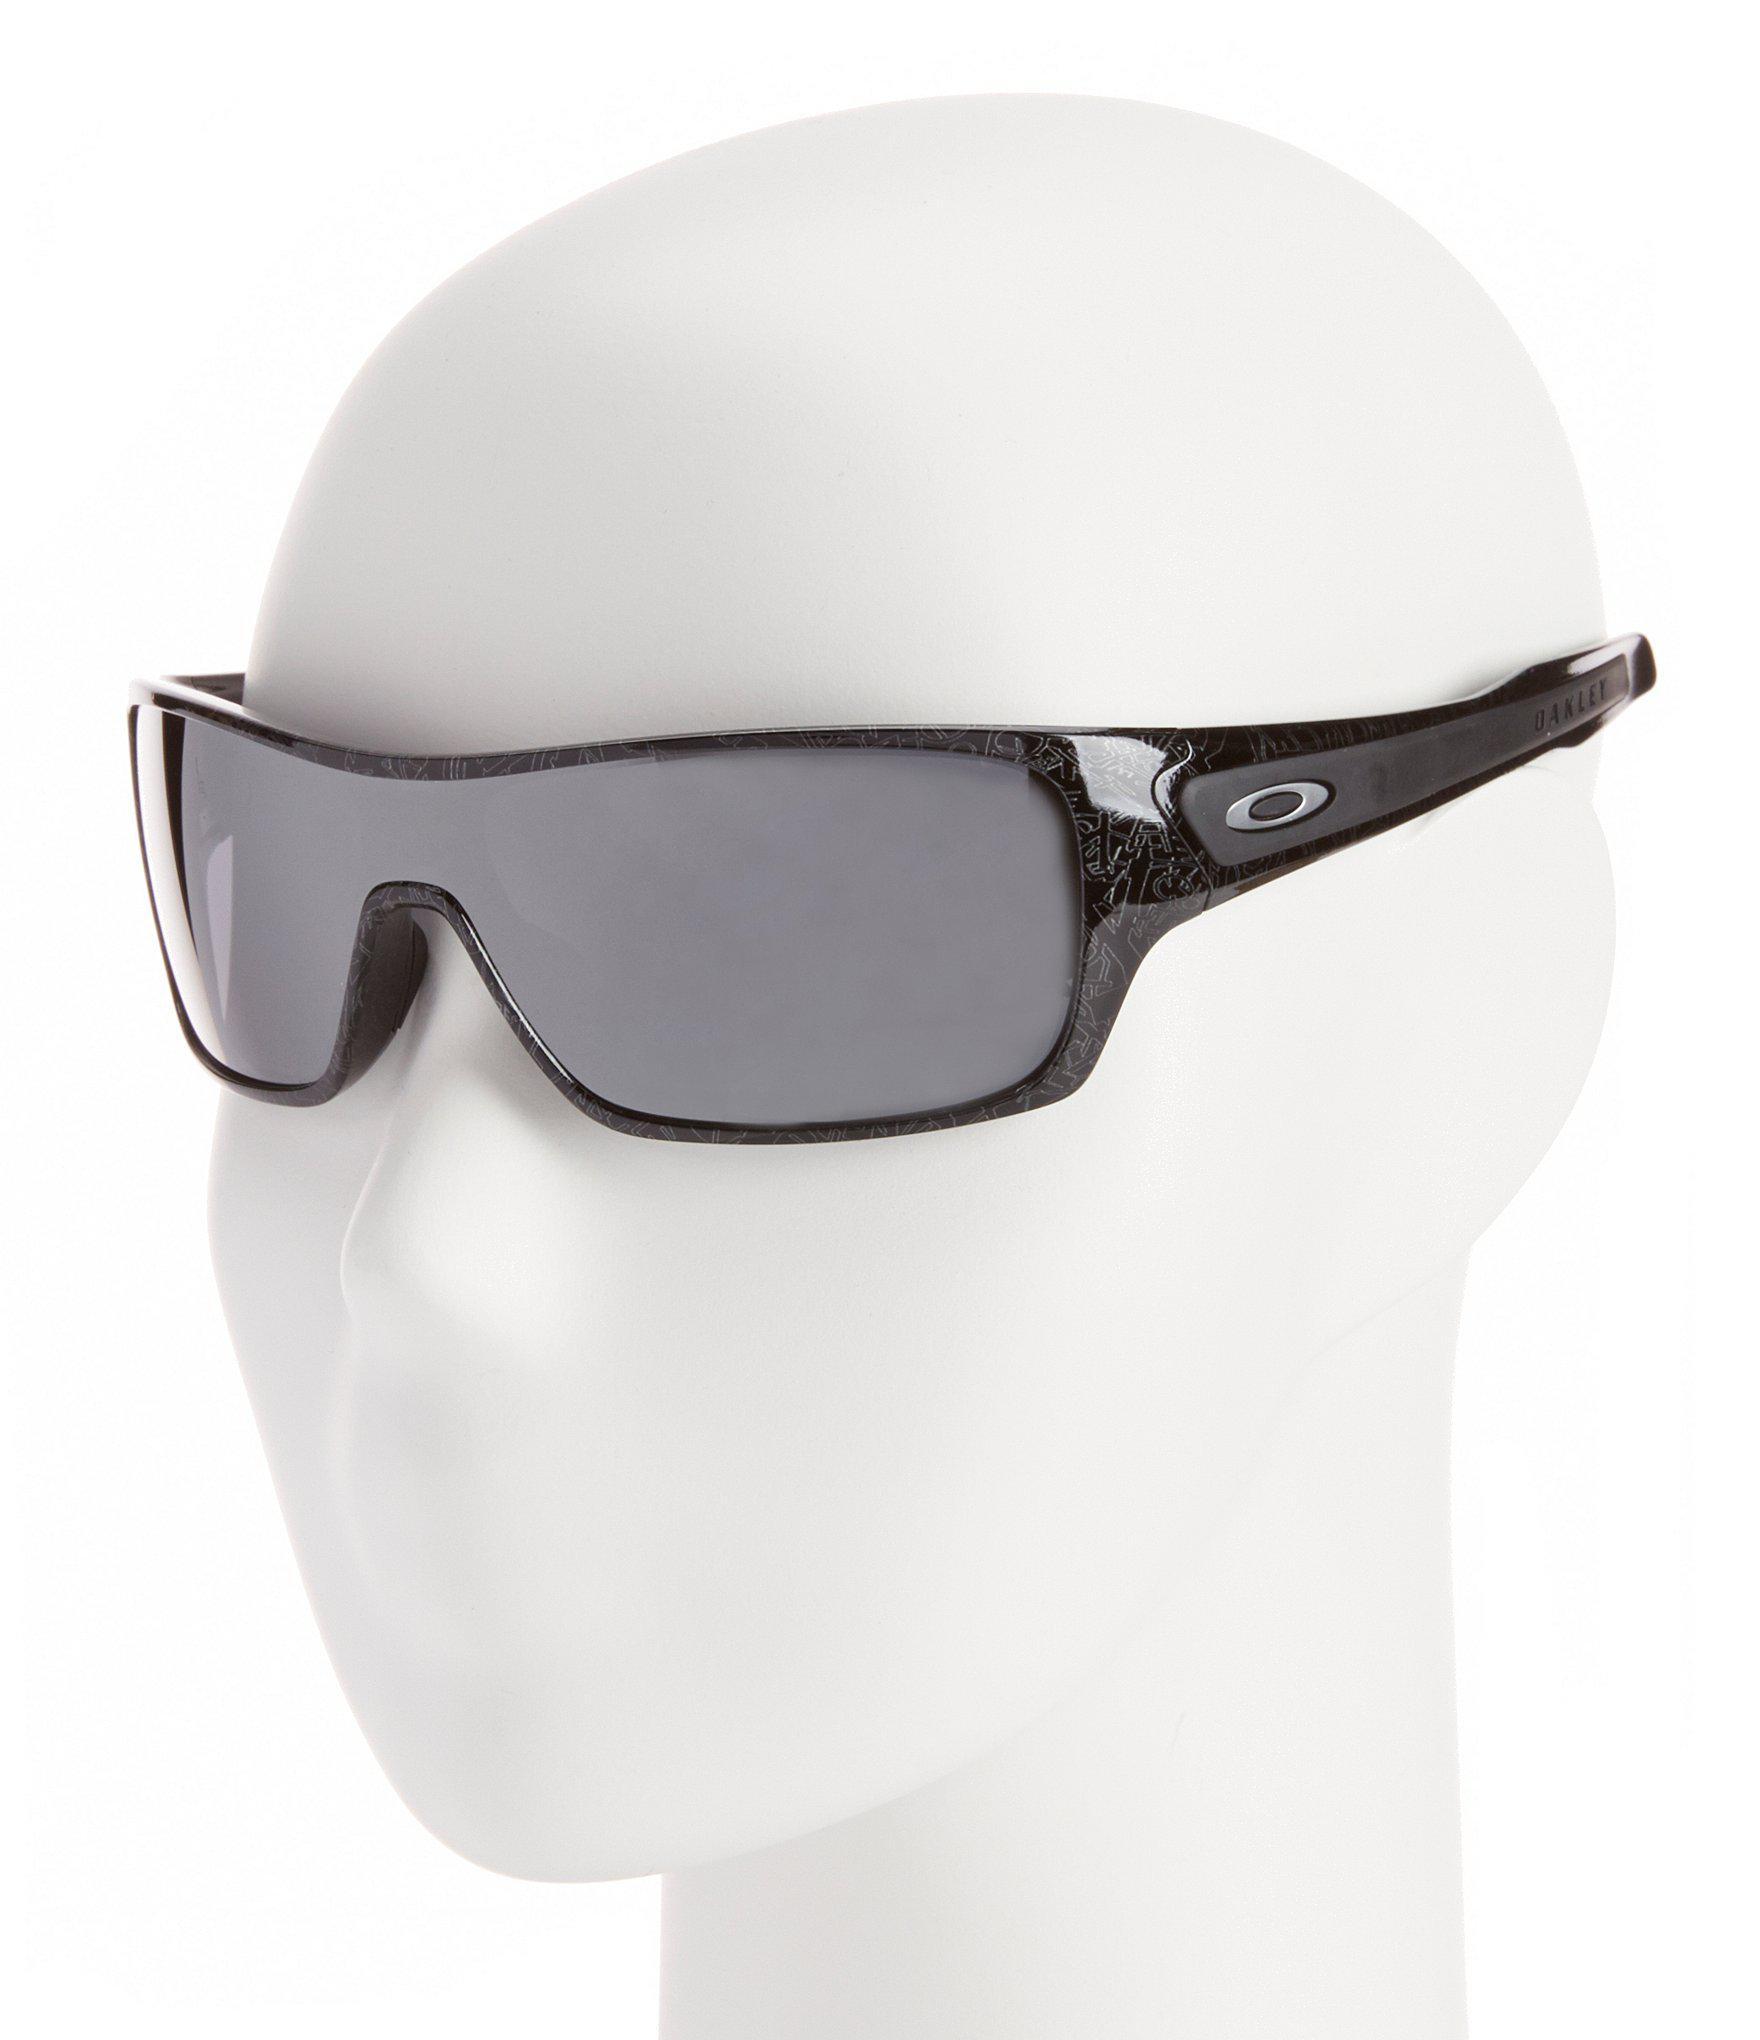 da6949ae05 Oakley - Turbine Mirrored Rectangular Black Sunglasses for Men - Lyst. View  fullscreen